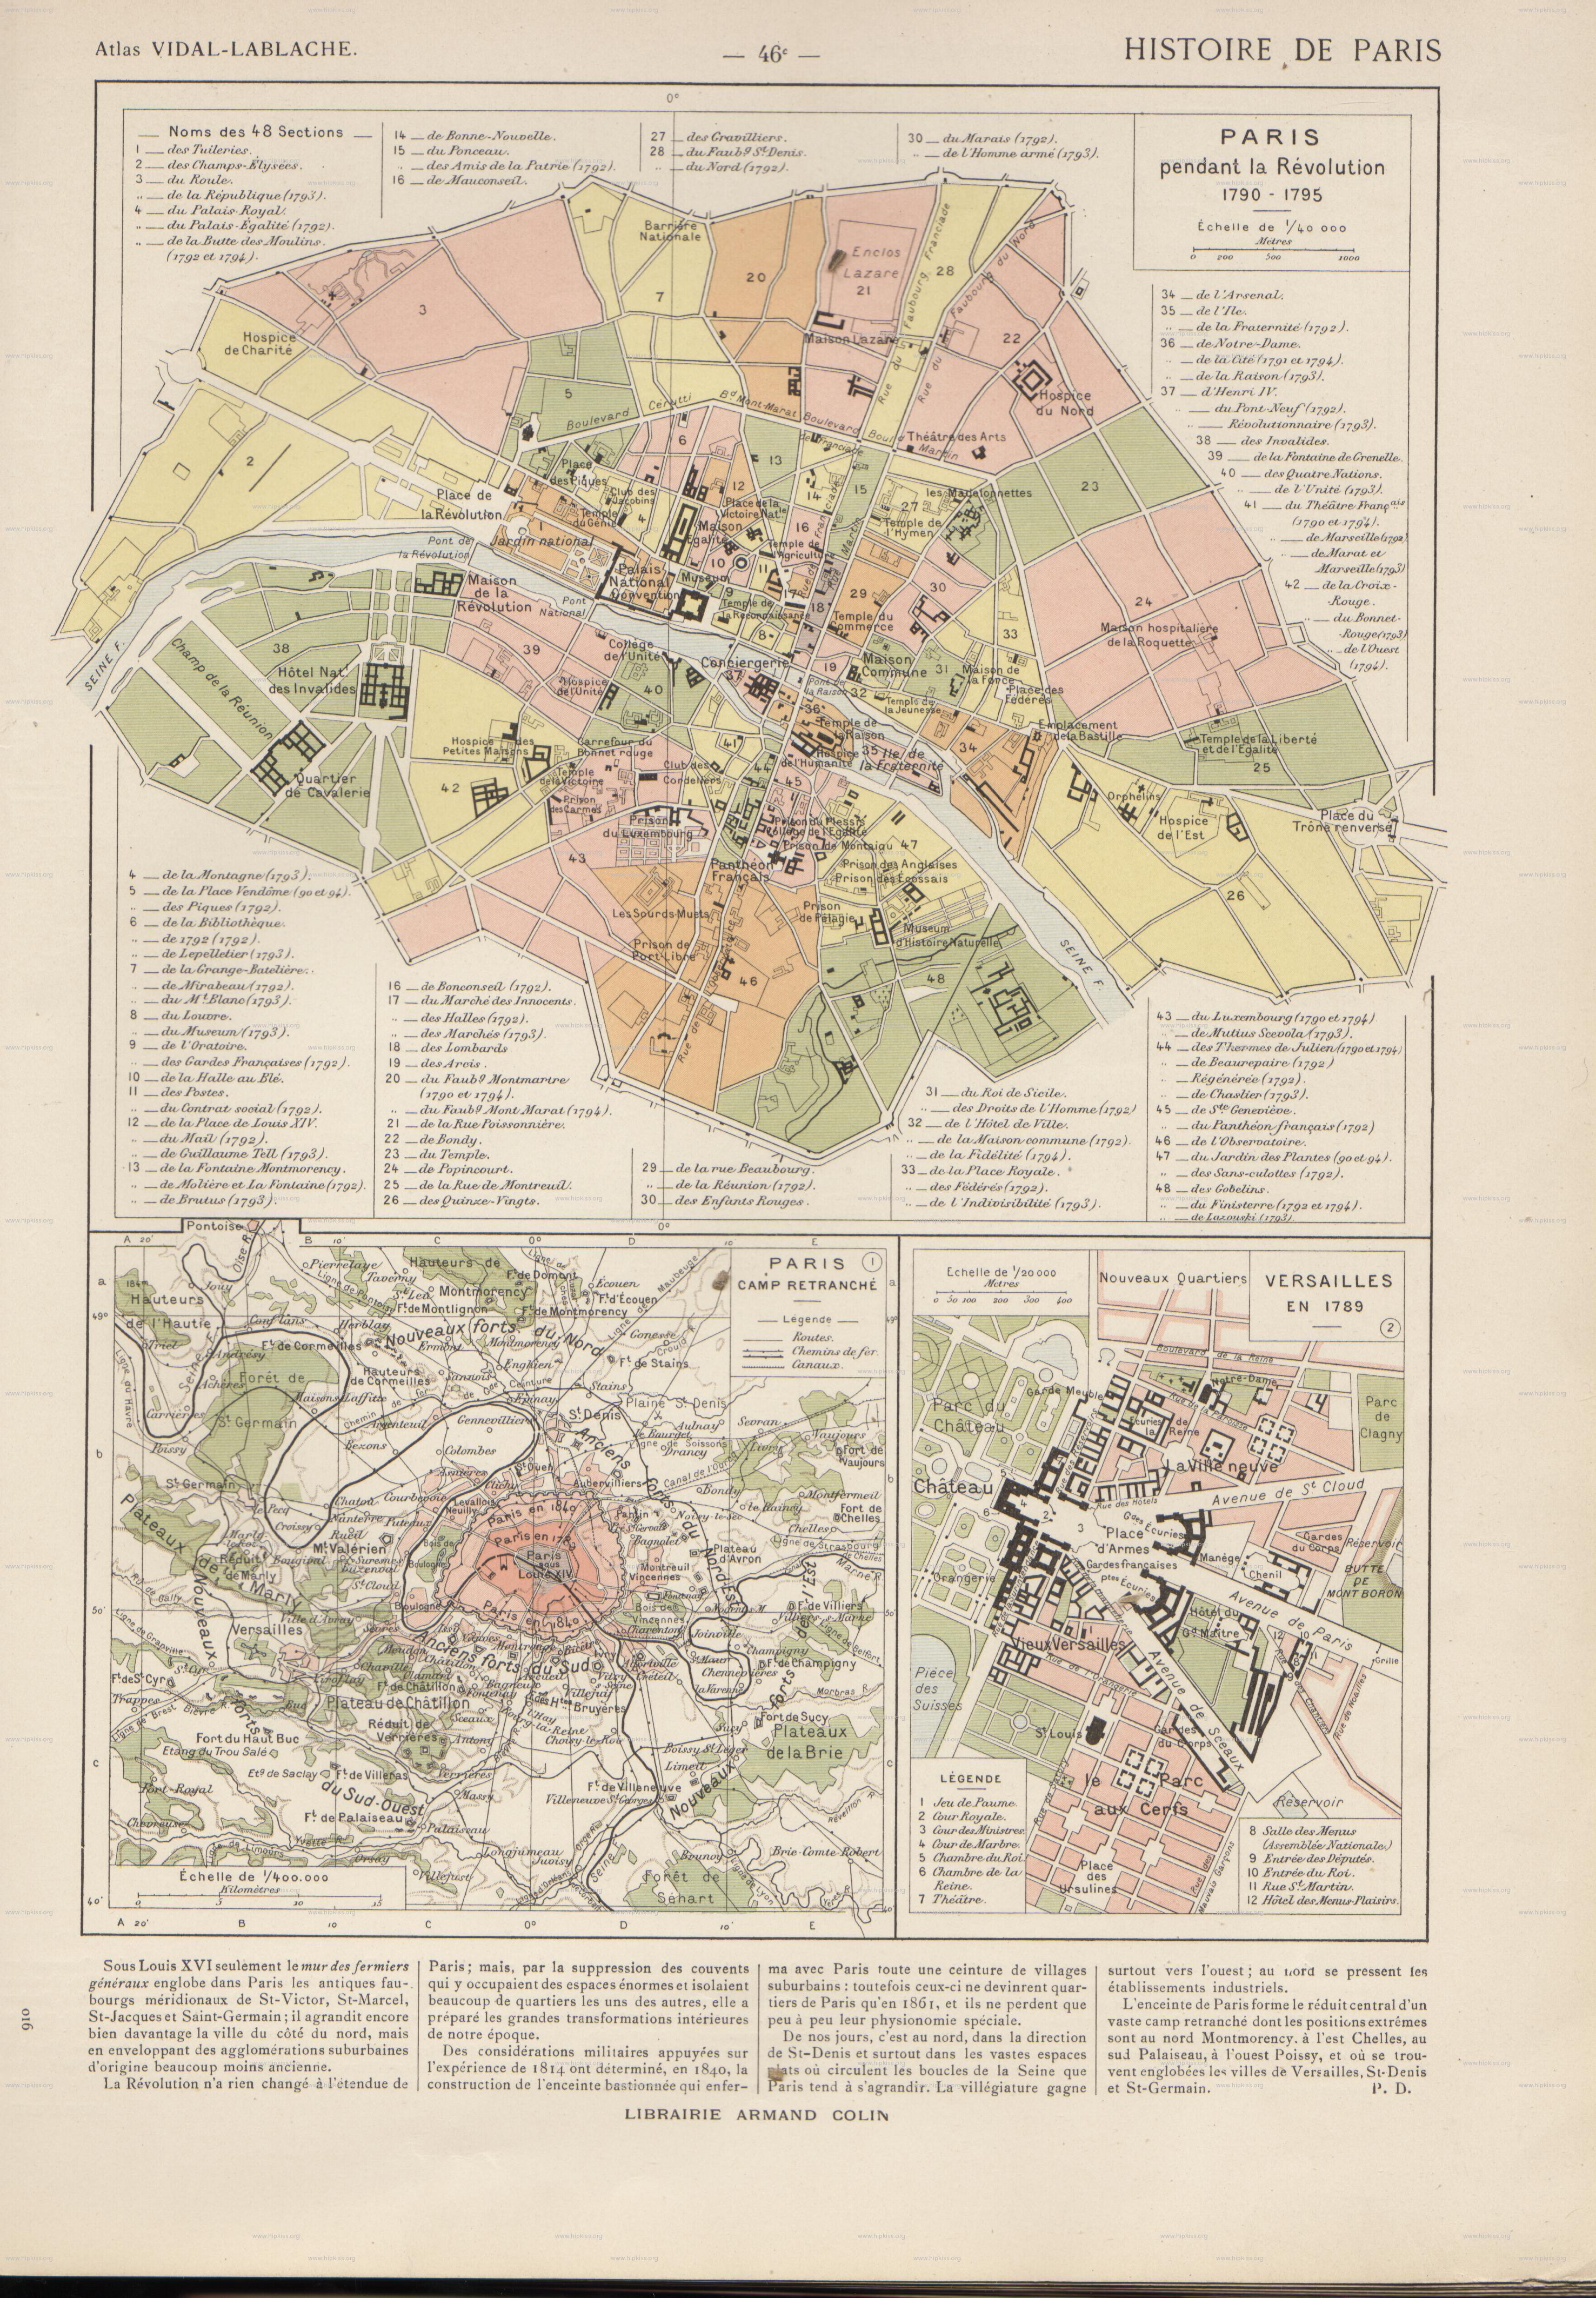 Versailles Paris Map Paris 1795 And Versailles